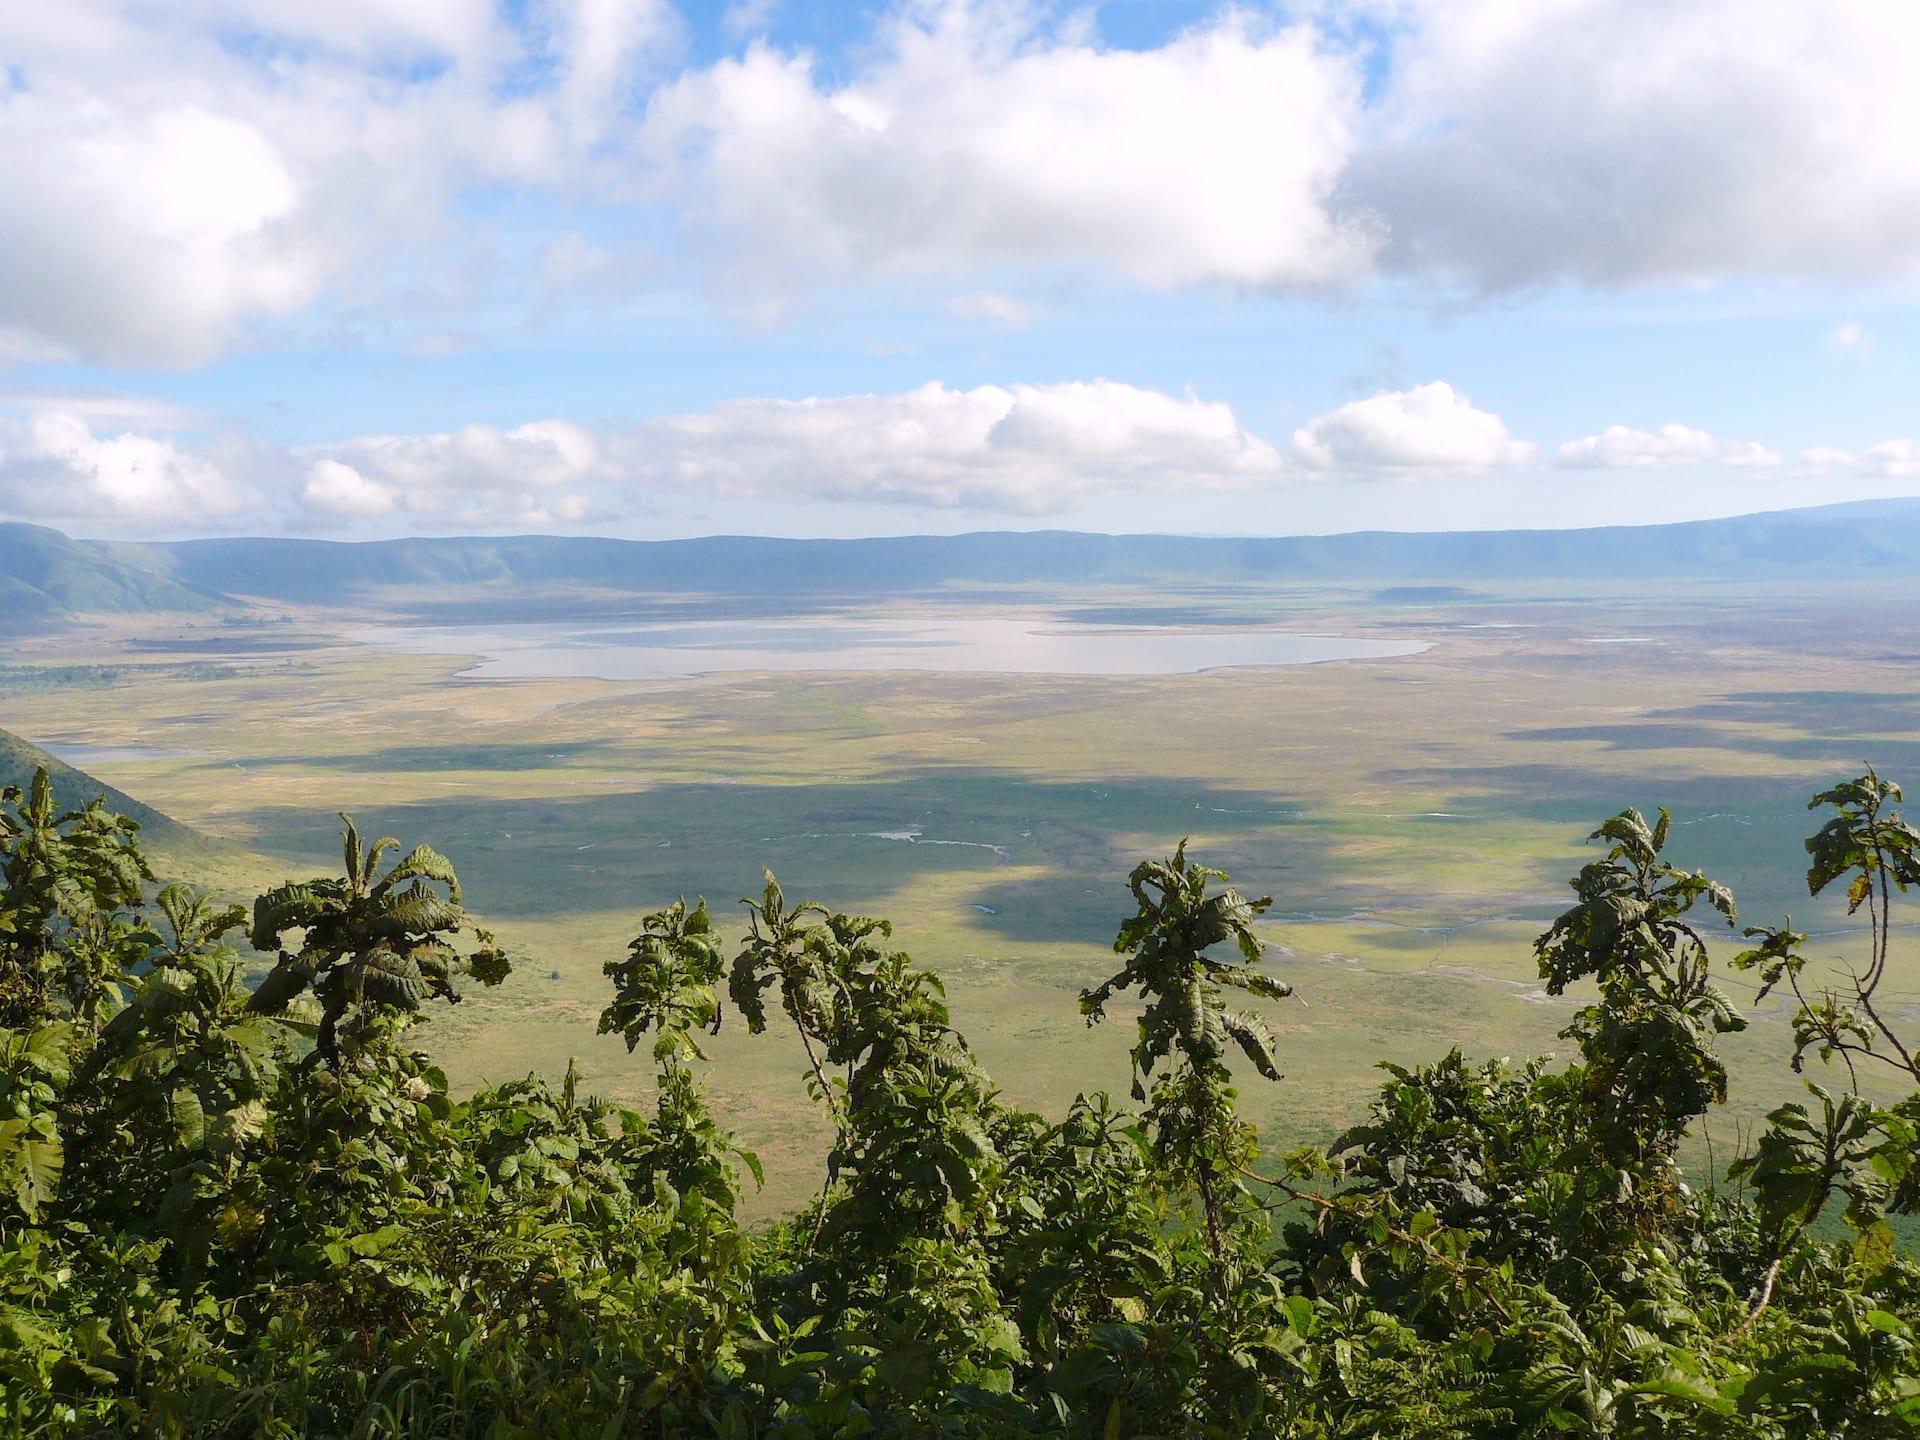 ALGEMEEN - TZ - Eyasi-crater-ndutu-serengeti (2)_2